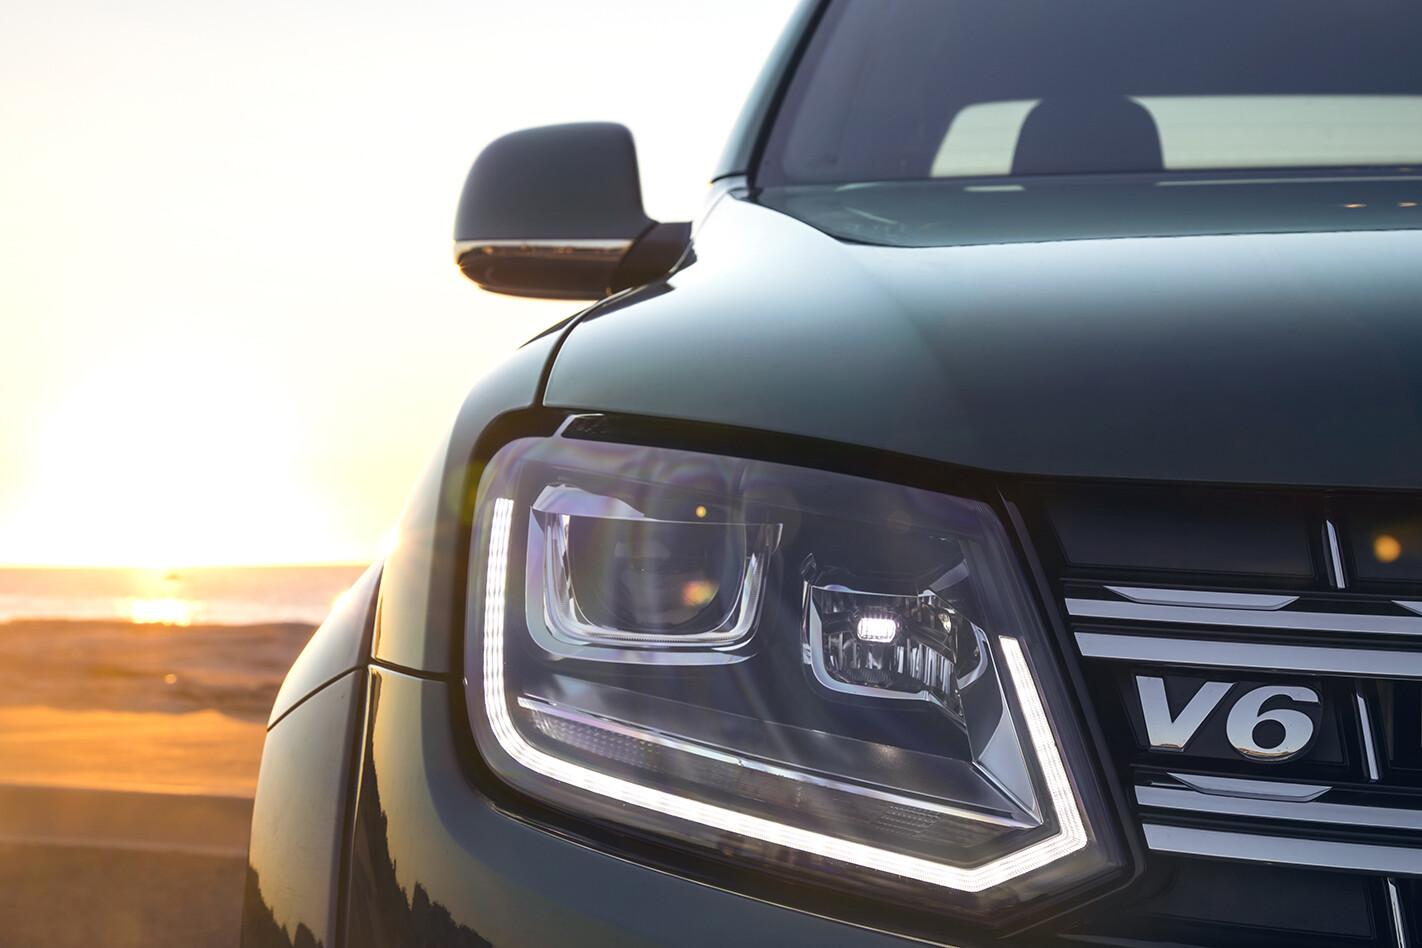 2019 VW Amarok 580 Headlampdetail Jpg